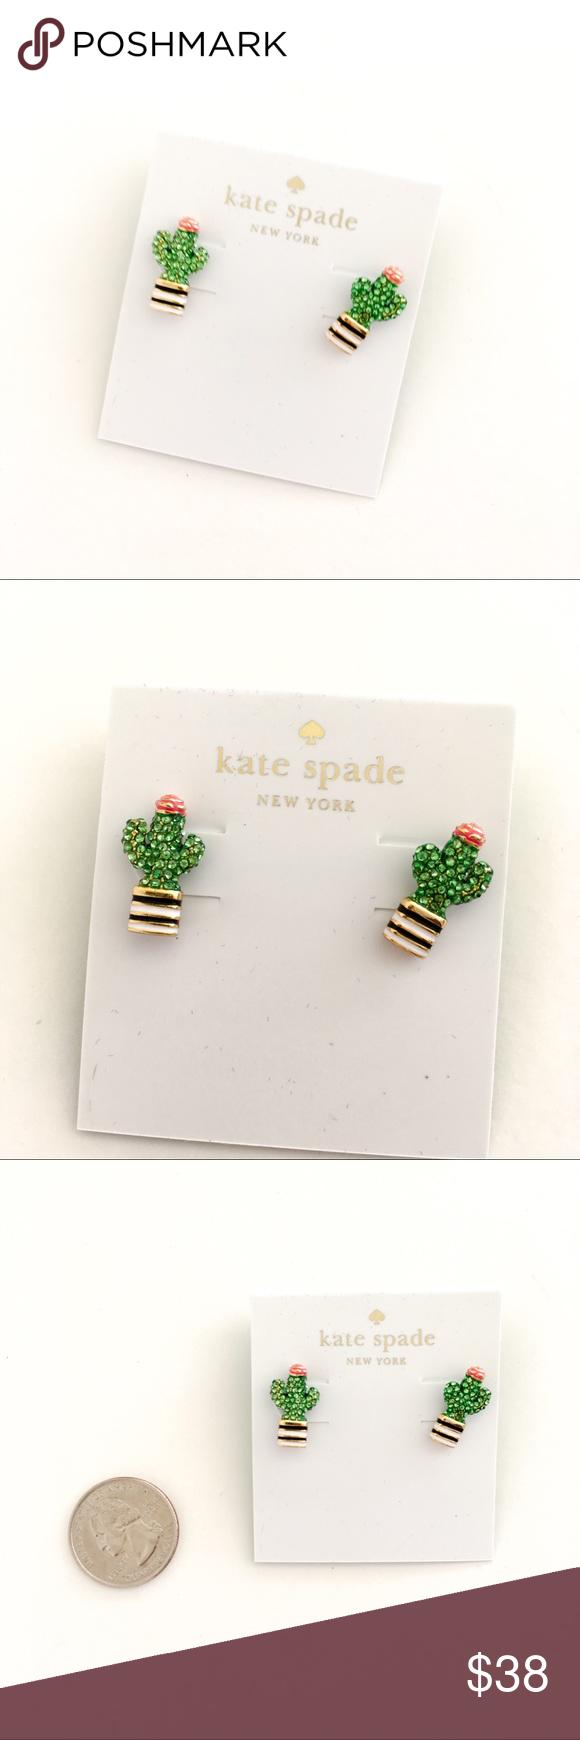 Kate Spade Cactus Earrings Nwt My Posh Picks Pinterest Kate